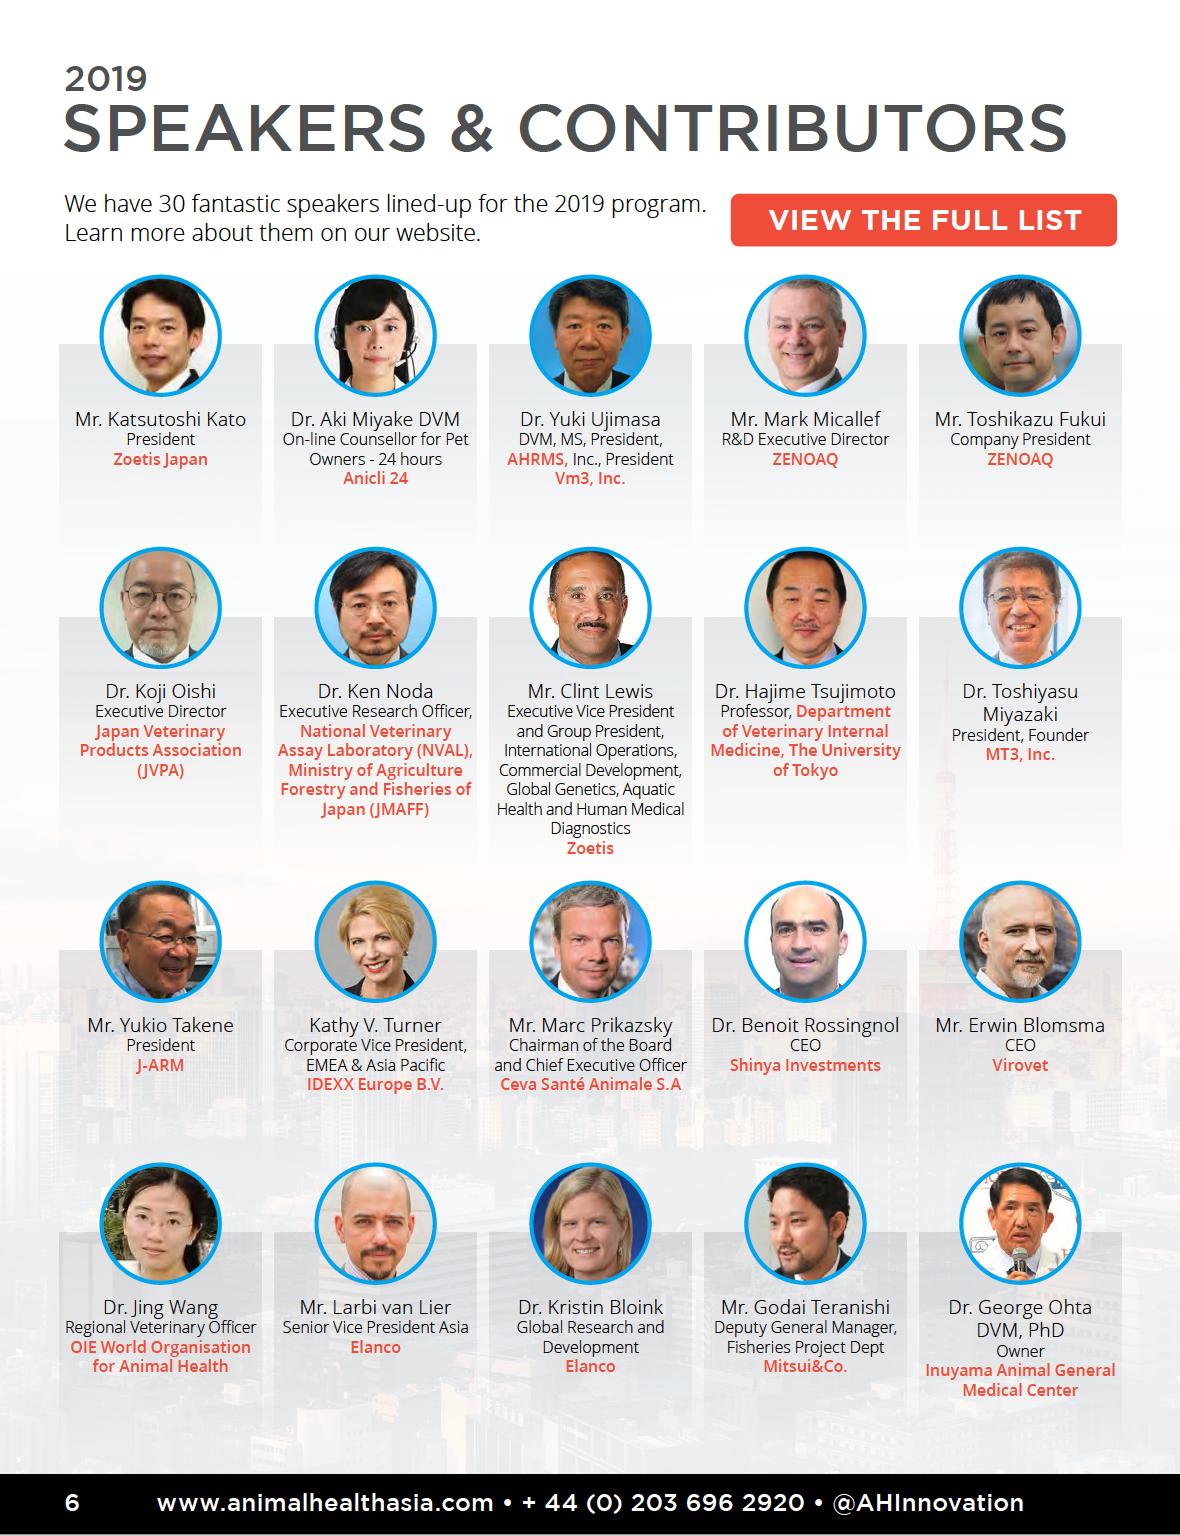 Animal Health Innovation Asia 2019 Speakers & Contributors